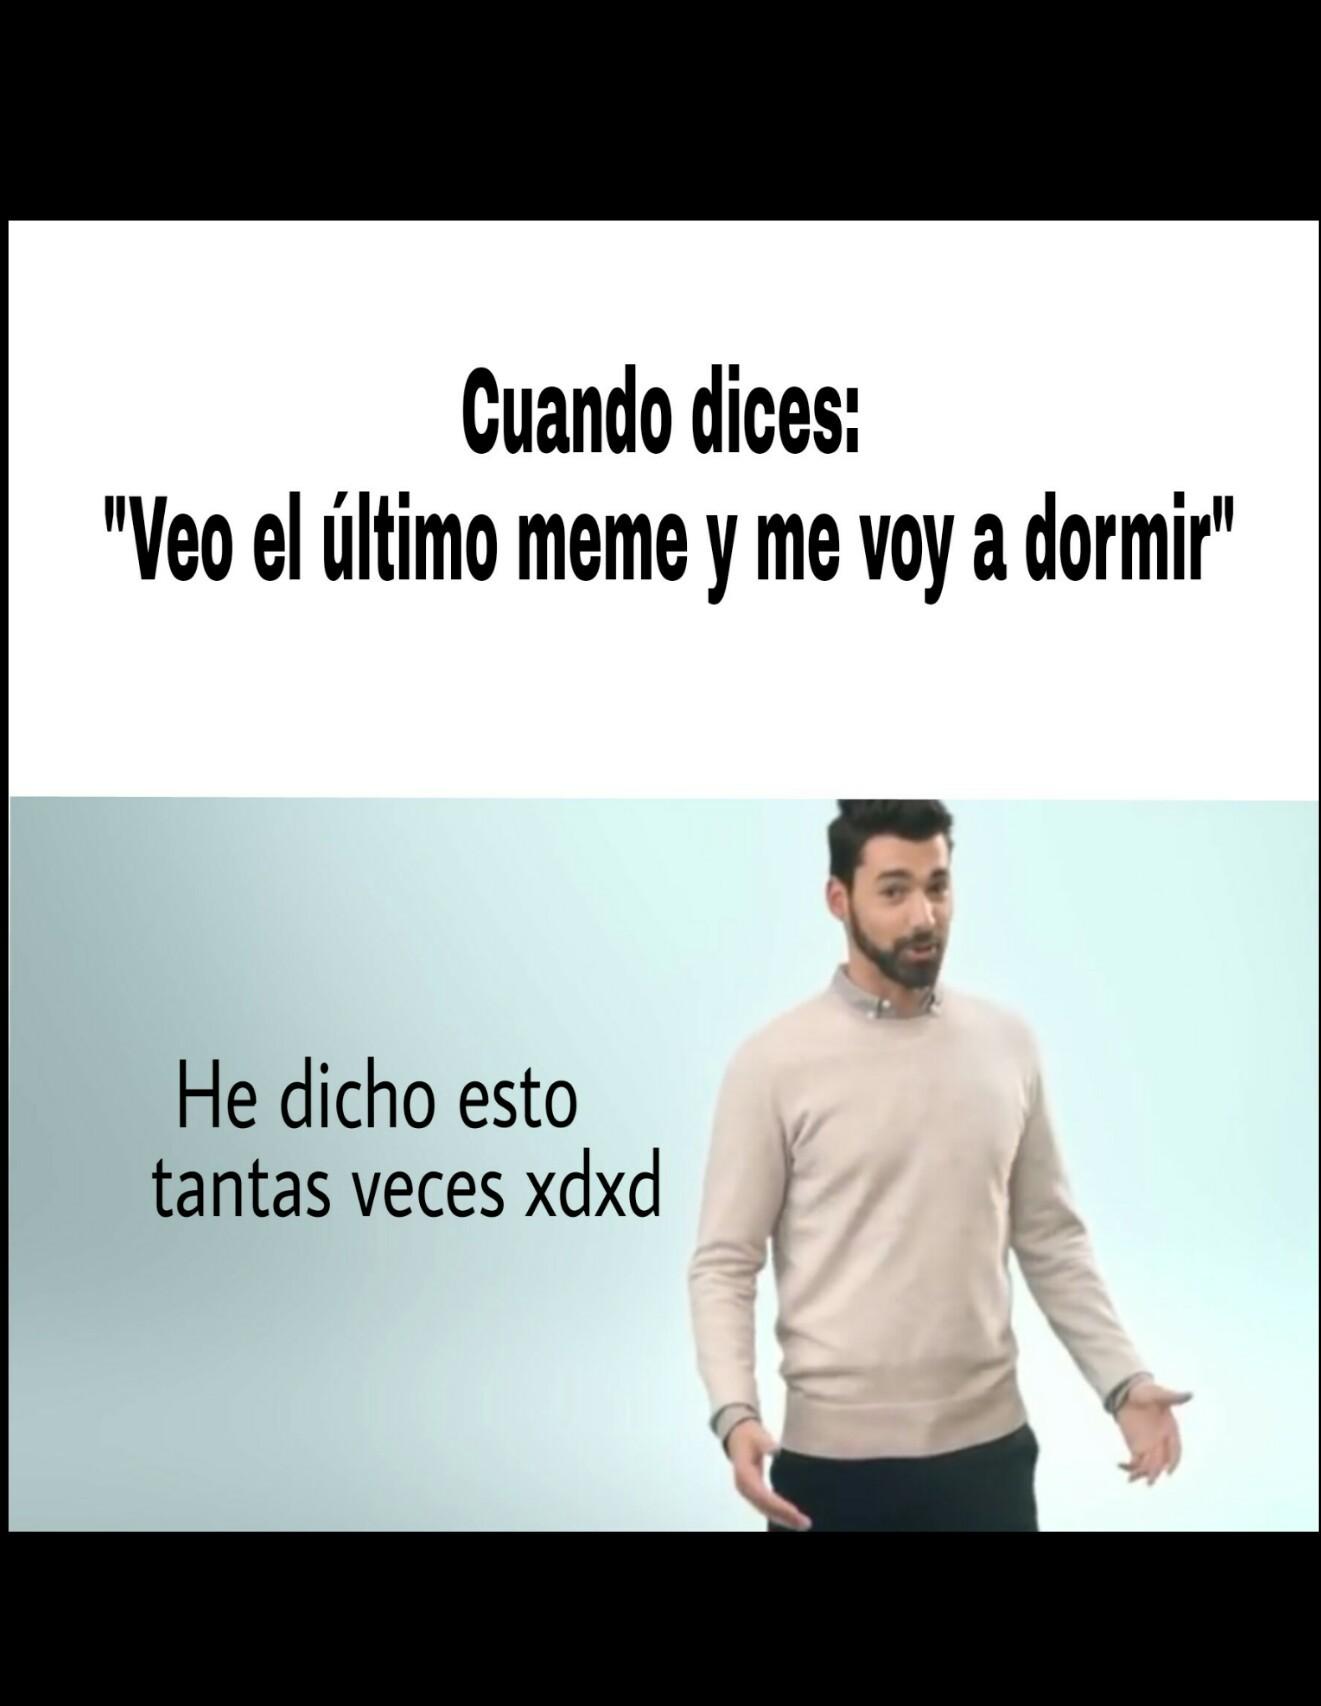 Problemas de vicios xd - meme